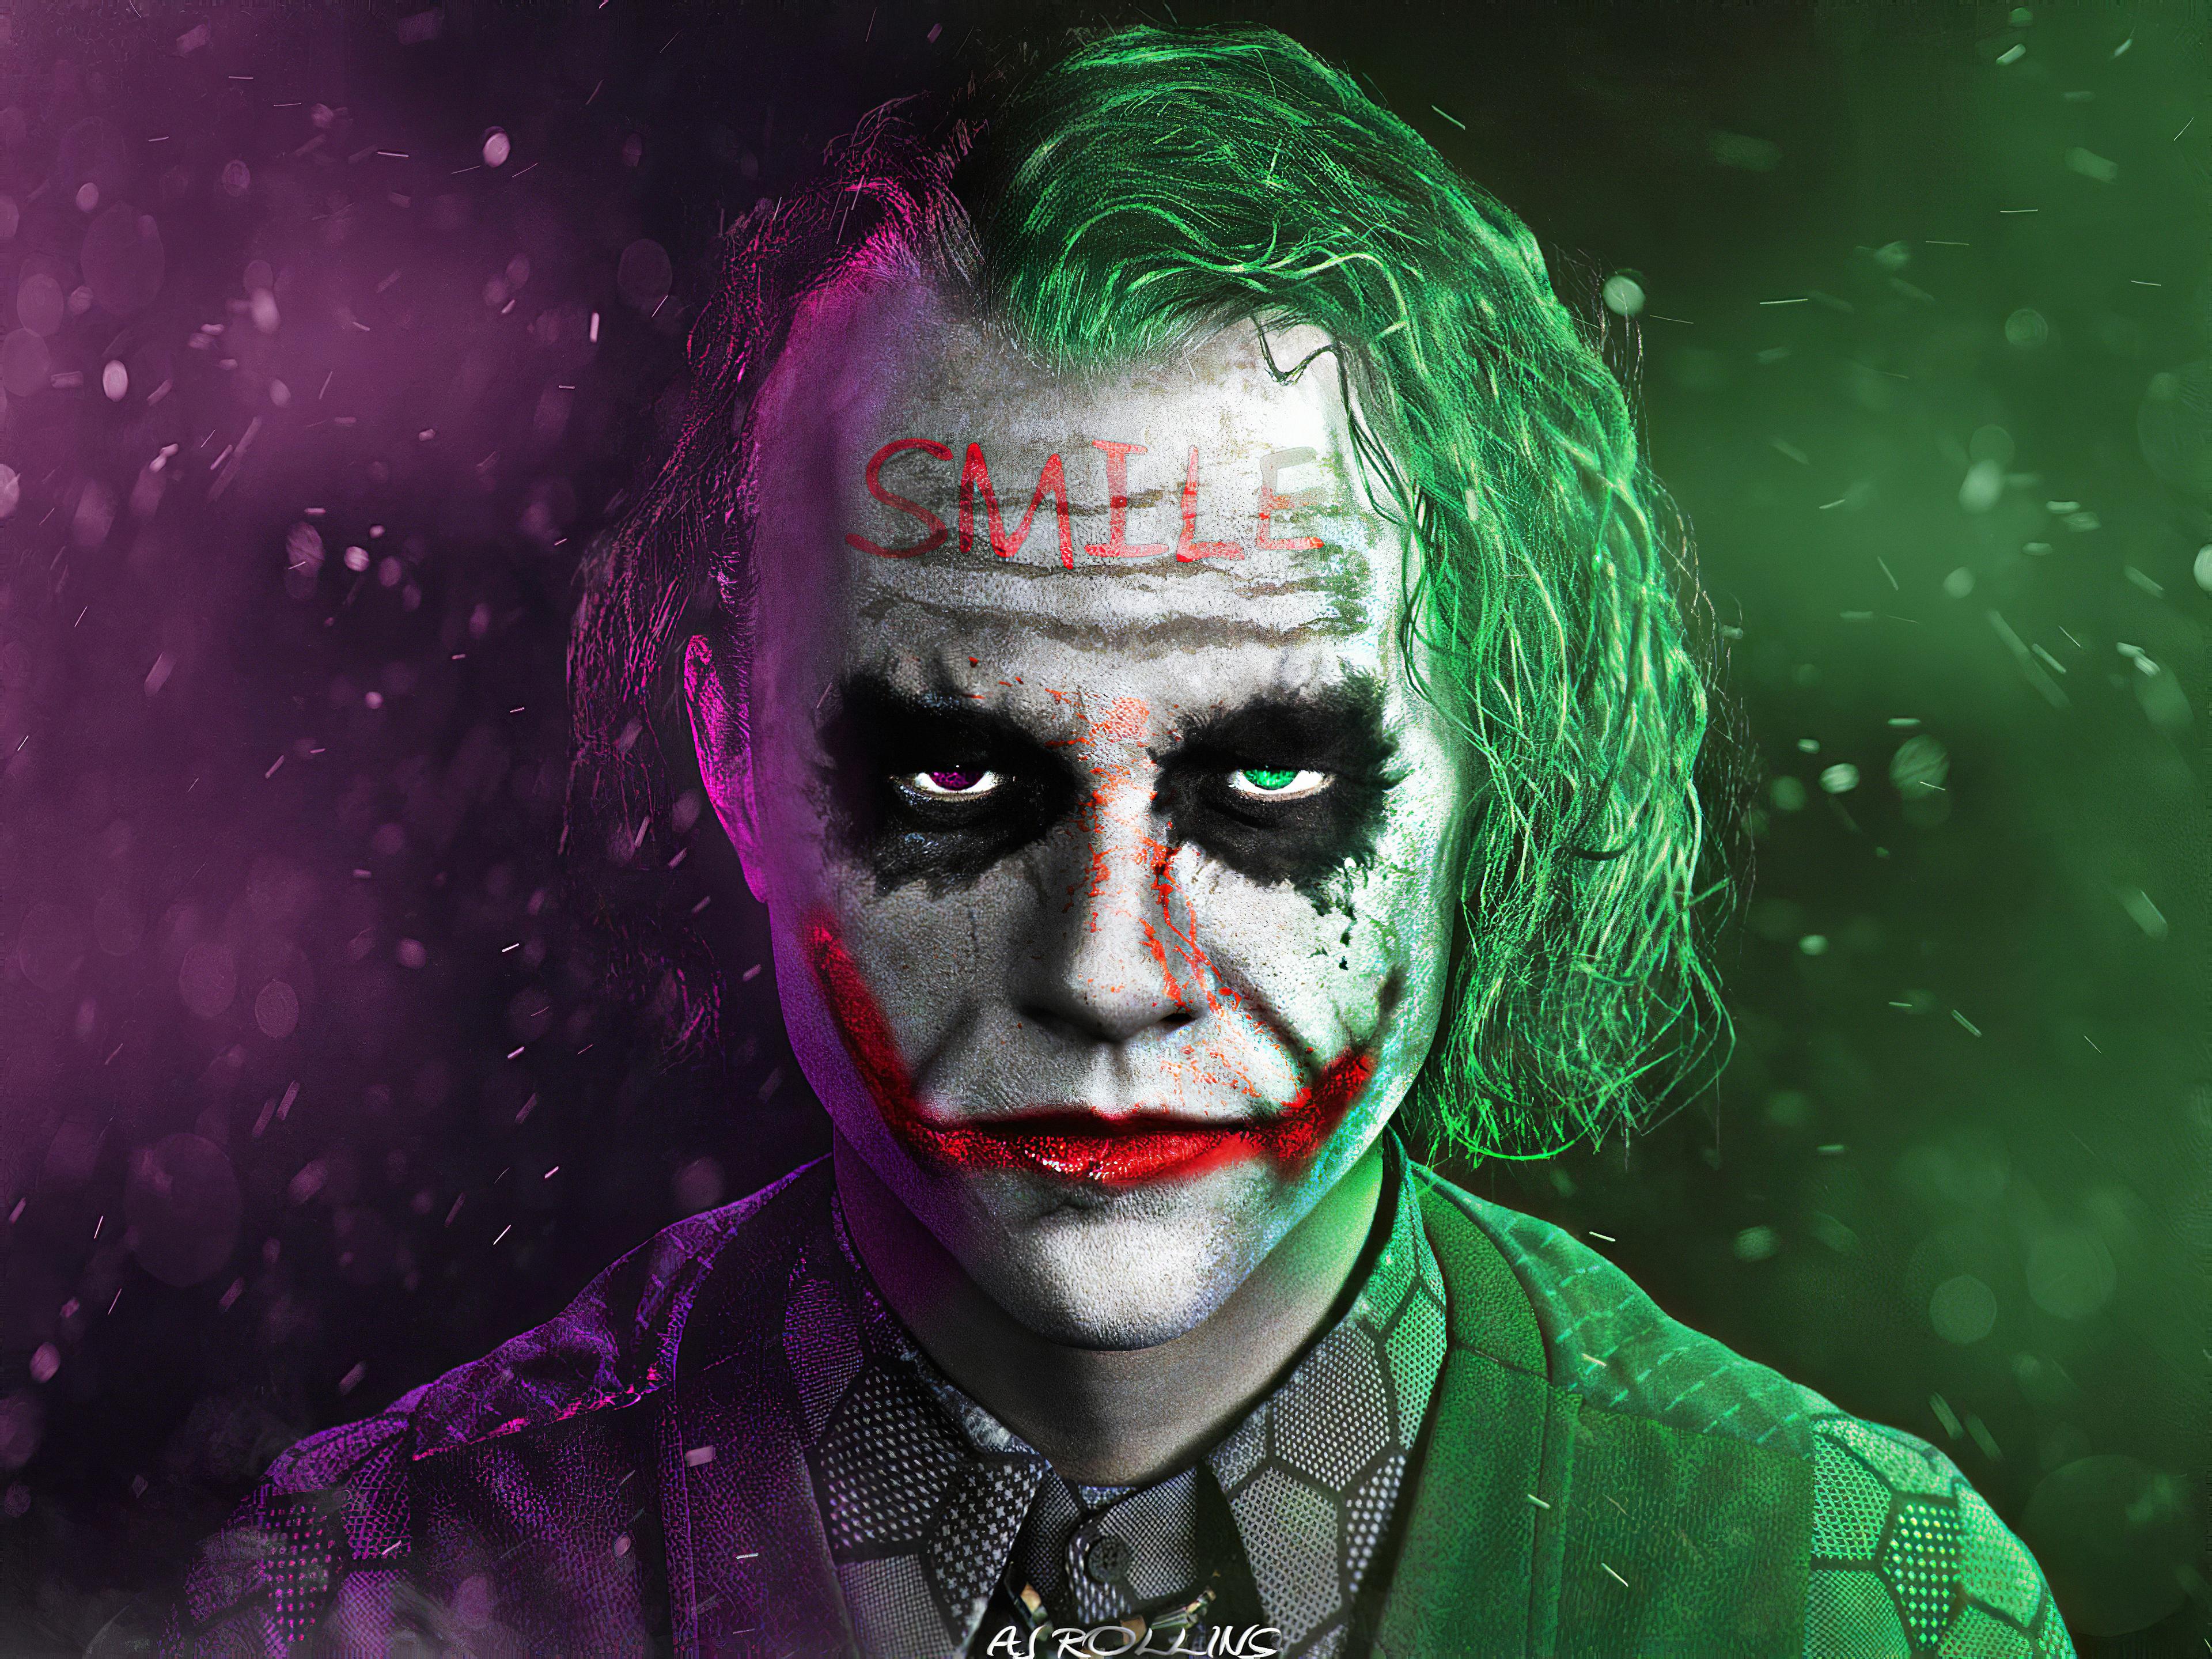 Wallpaper Phone 4k Joker | Joker hd wallpaper, Joker ...